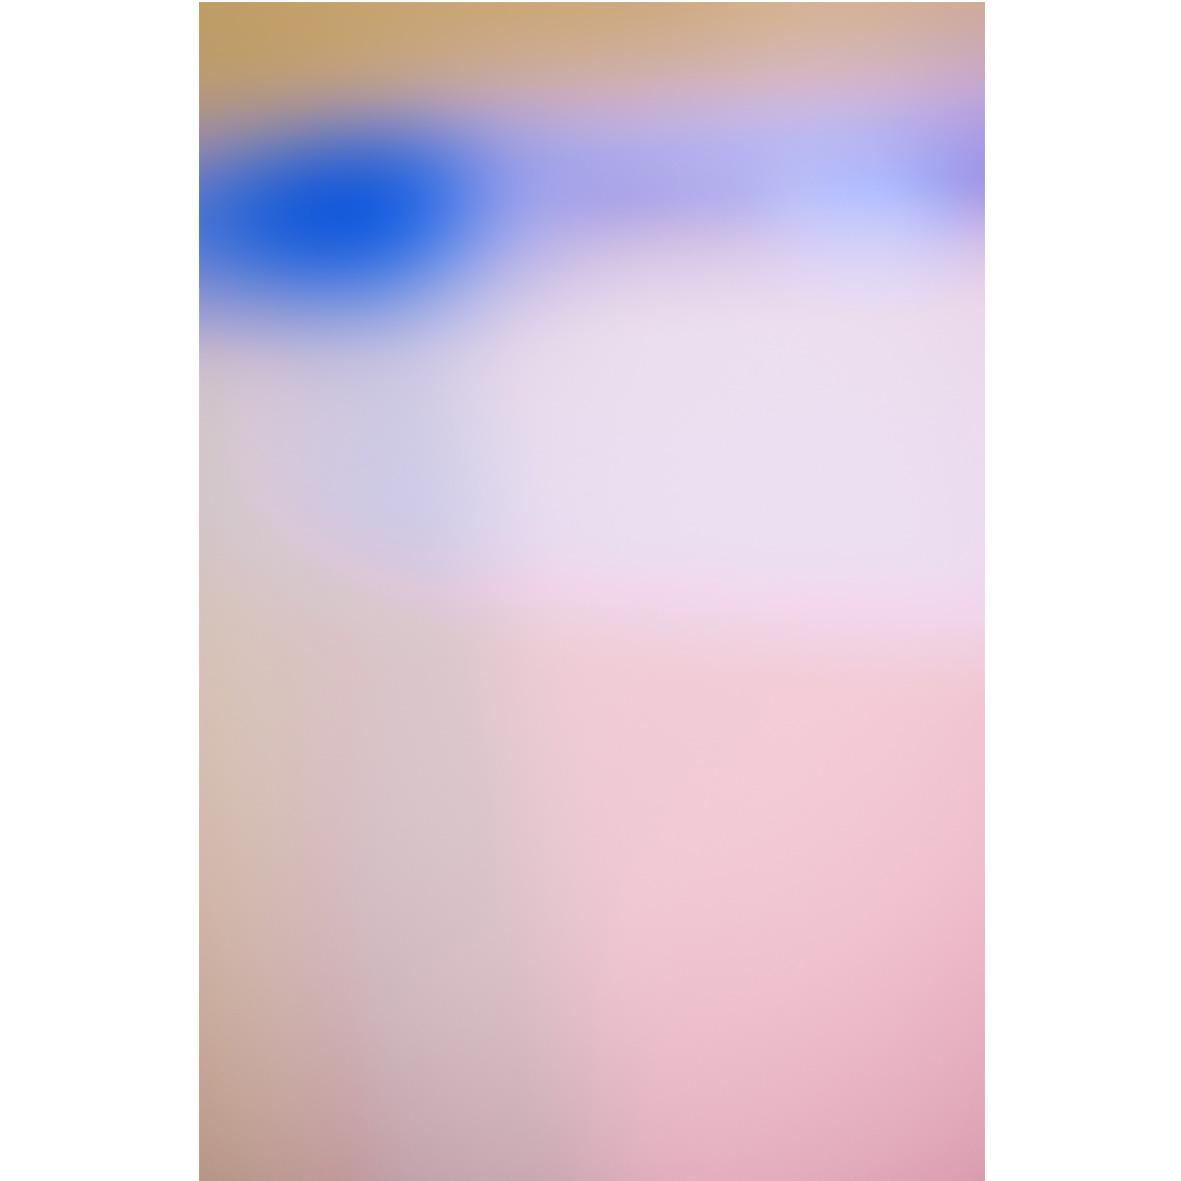 Clare Patrick 3, a self portrait (series of 3) 2017 Inkjet print on duratrans 167 x 111 cm